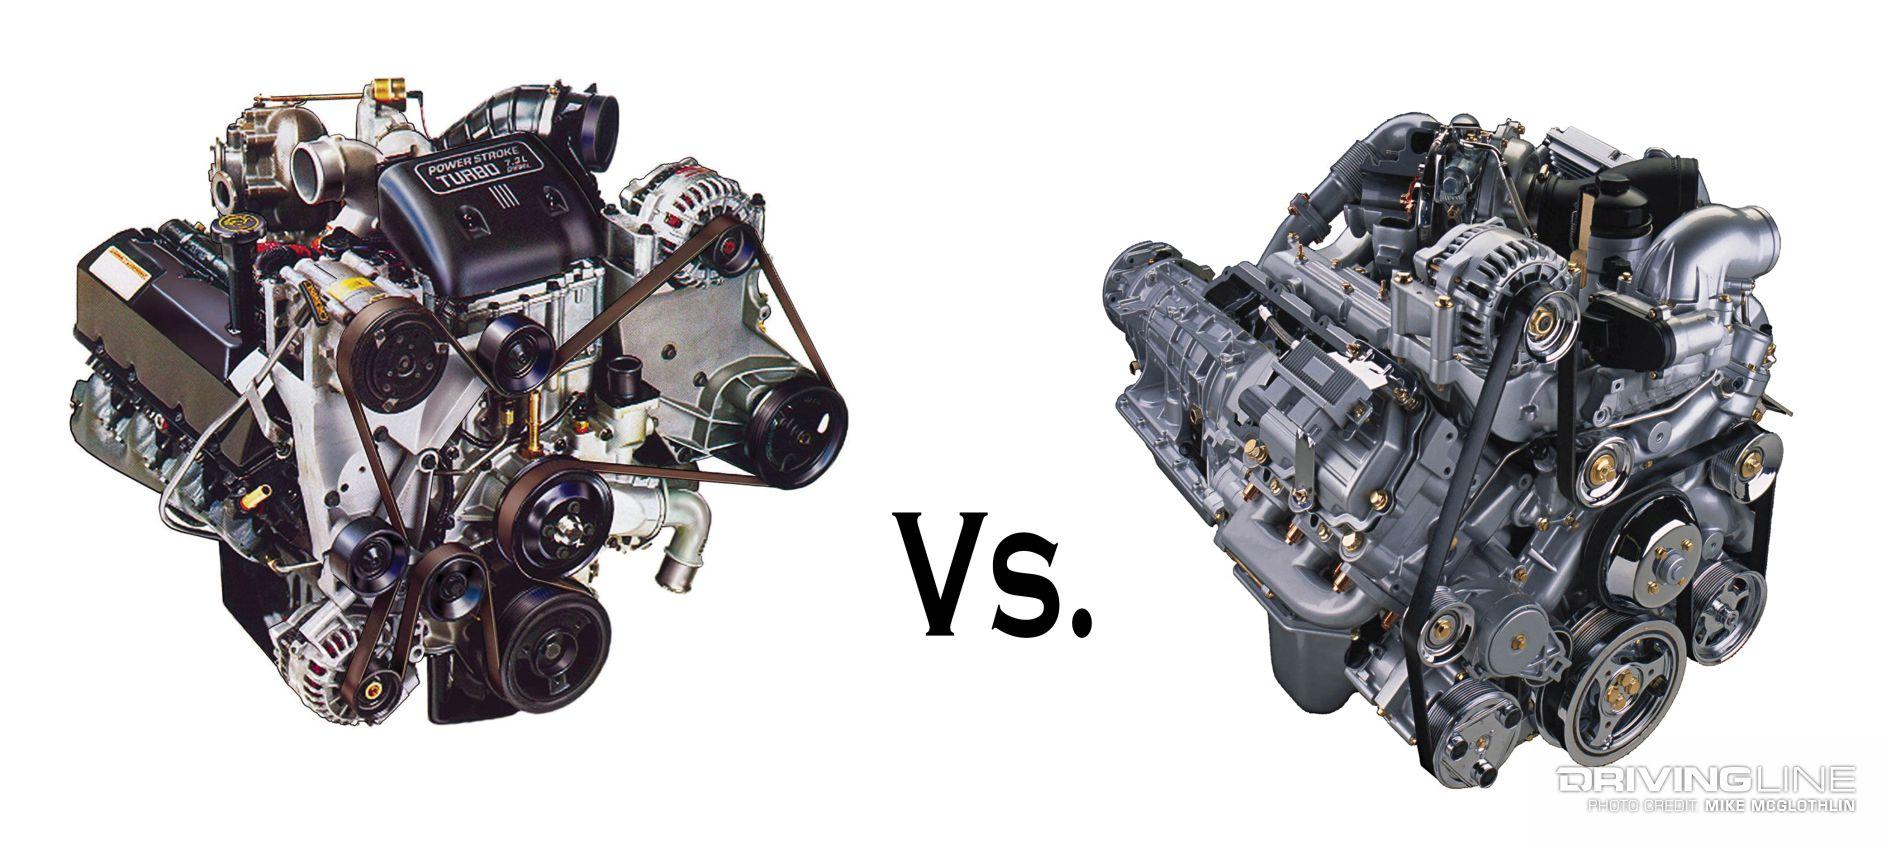 7 3 powerstroke diy dual battery system diagram 3l vs 6 0l which power stroke is really better drivingline 001 0